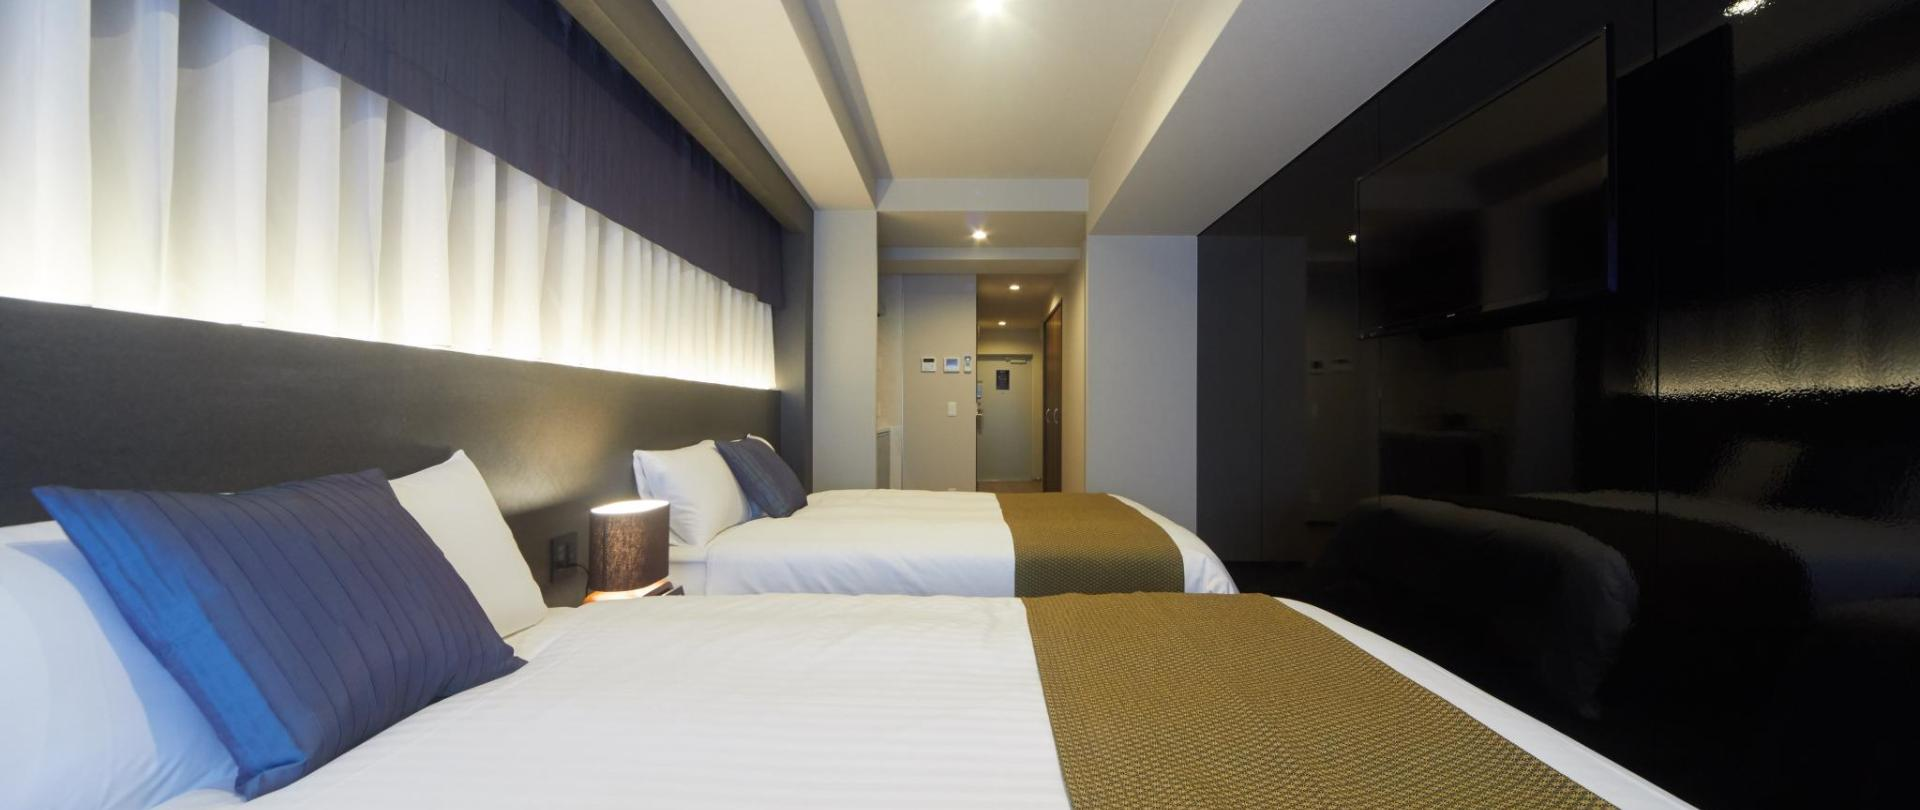 181217_HotelMondonce_144.jpg